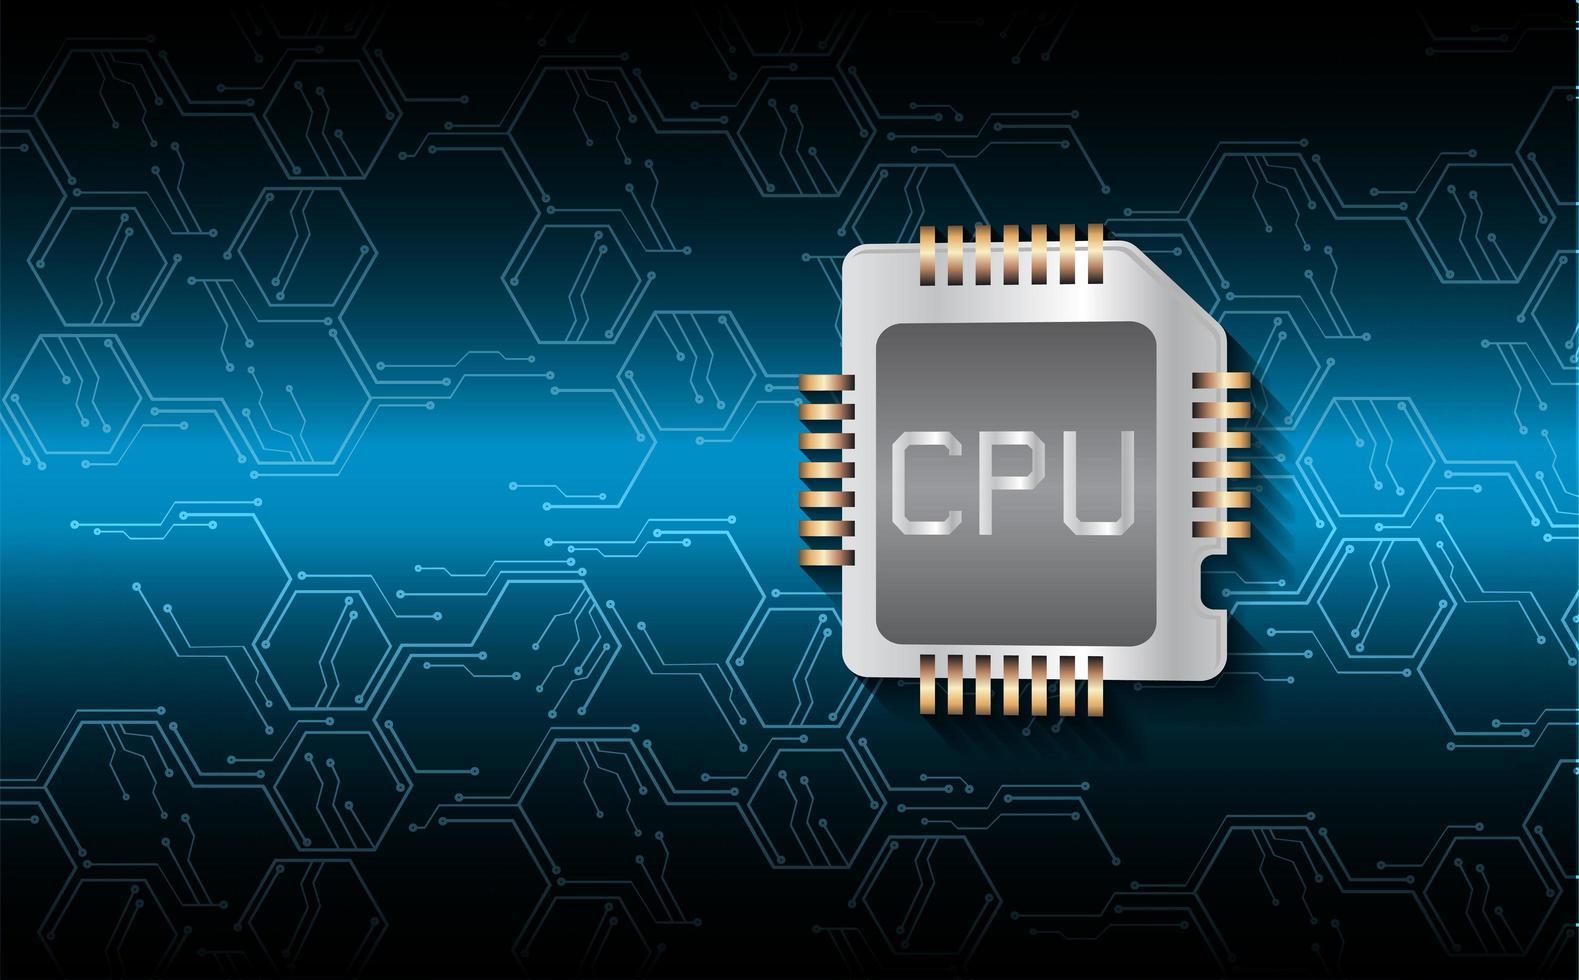 cpu cyberkrets framtida teknik koncept bakgrund vektor